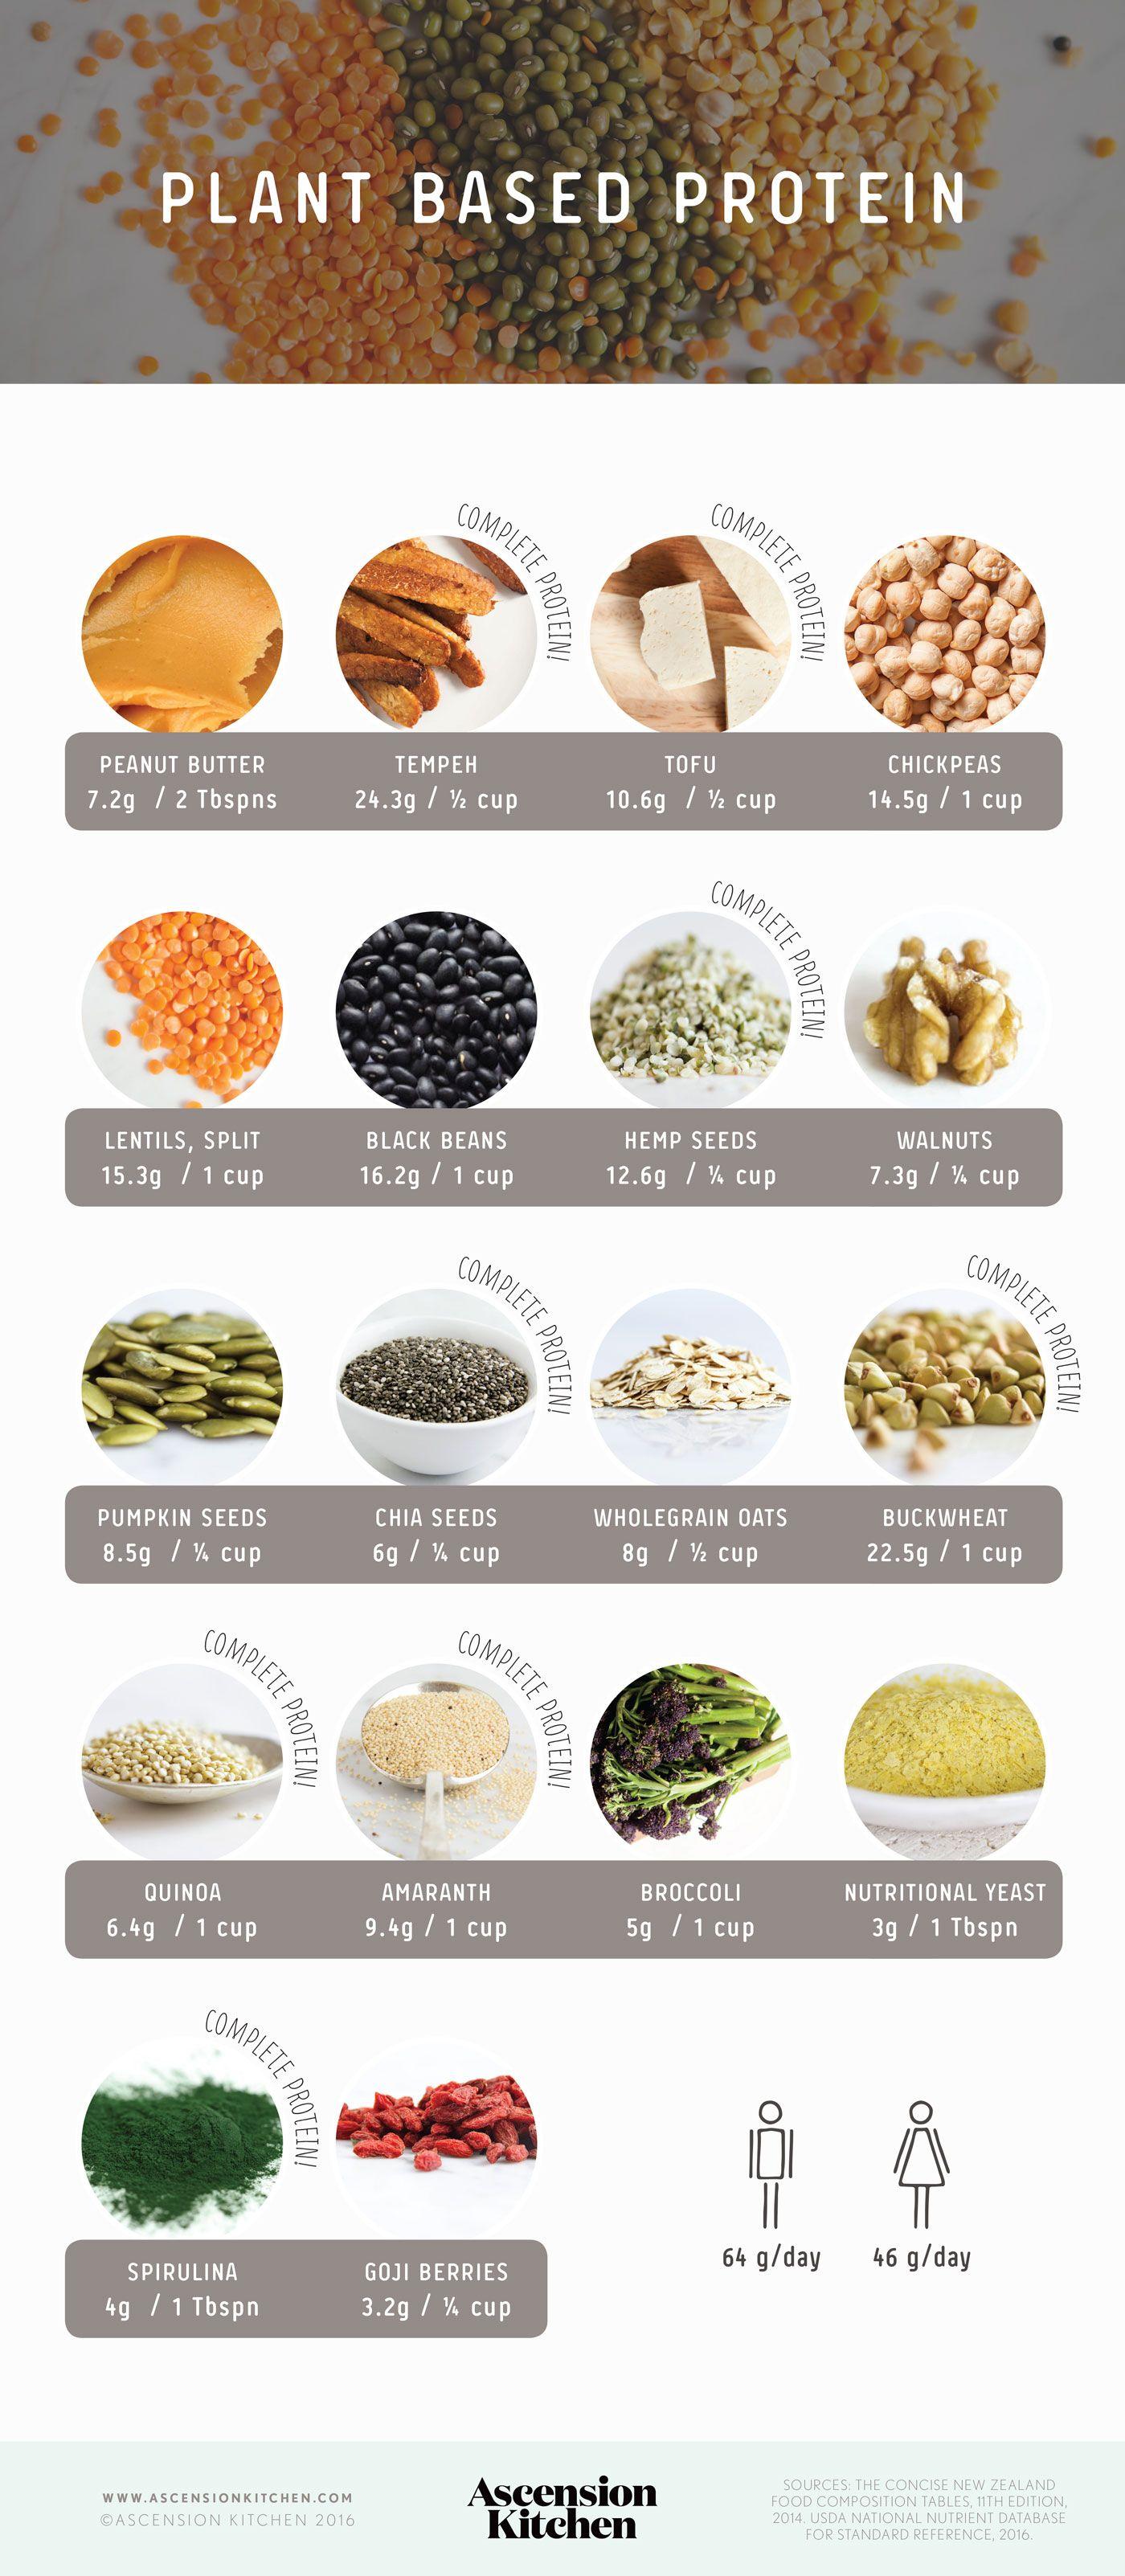 dieta a base de plantas o vegetales